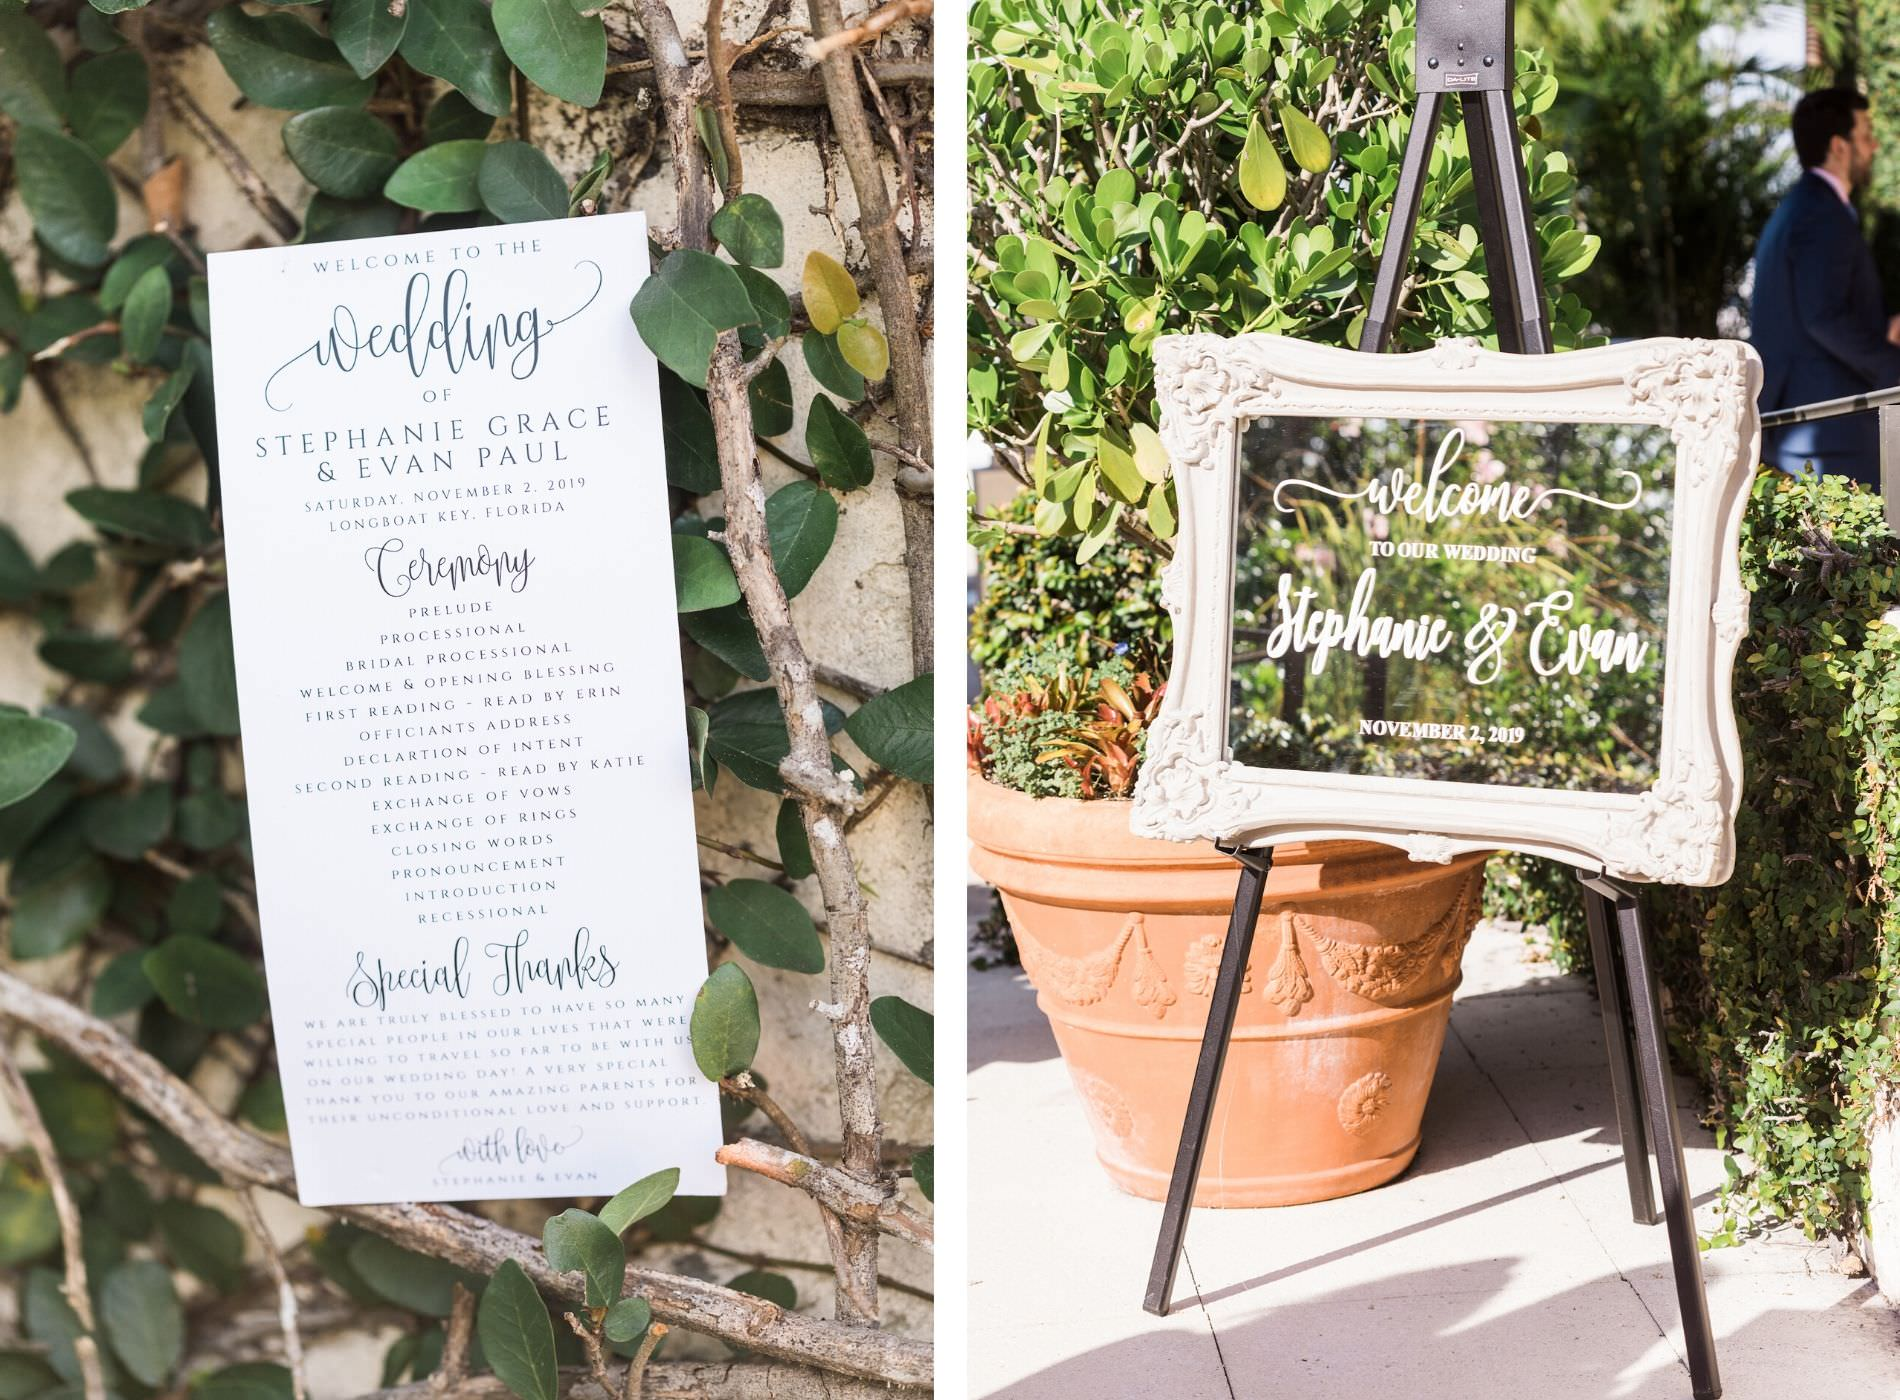 Wedding Welcome Mirror and Modern Ceremony Program